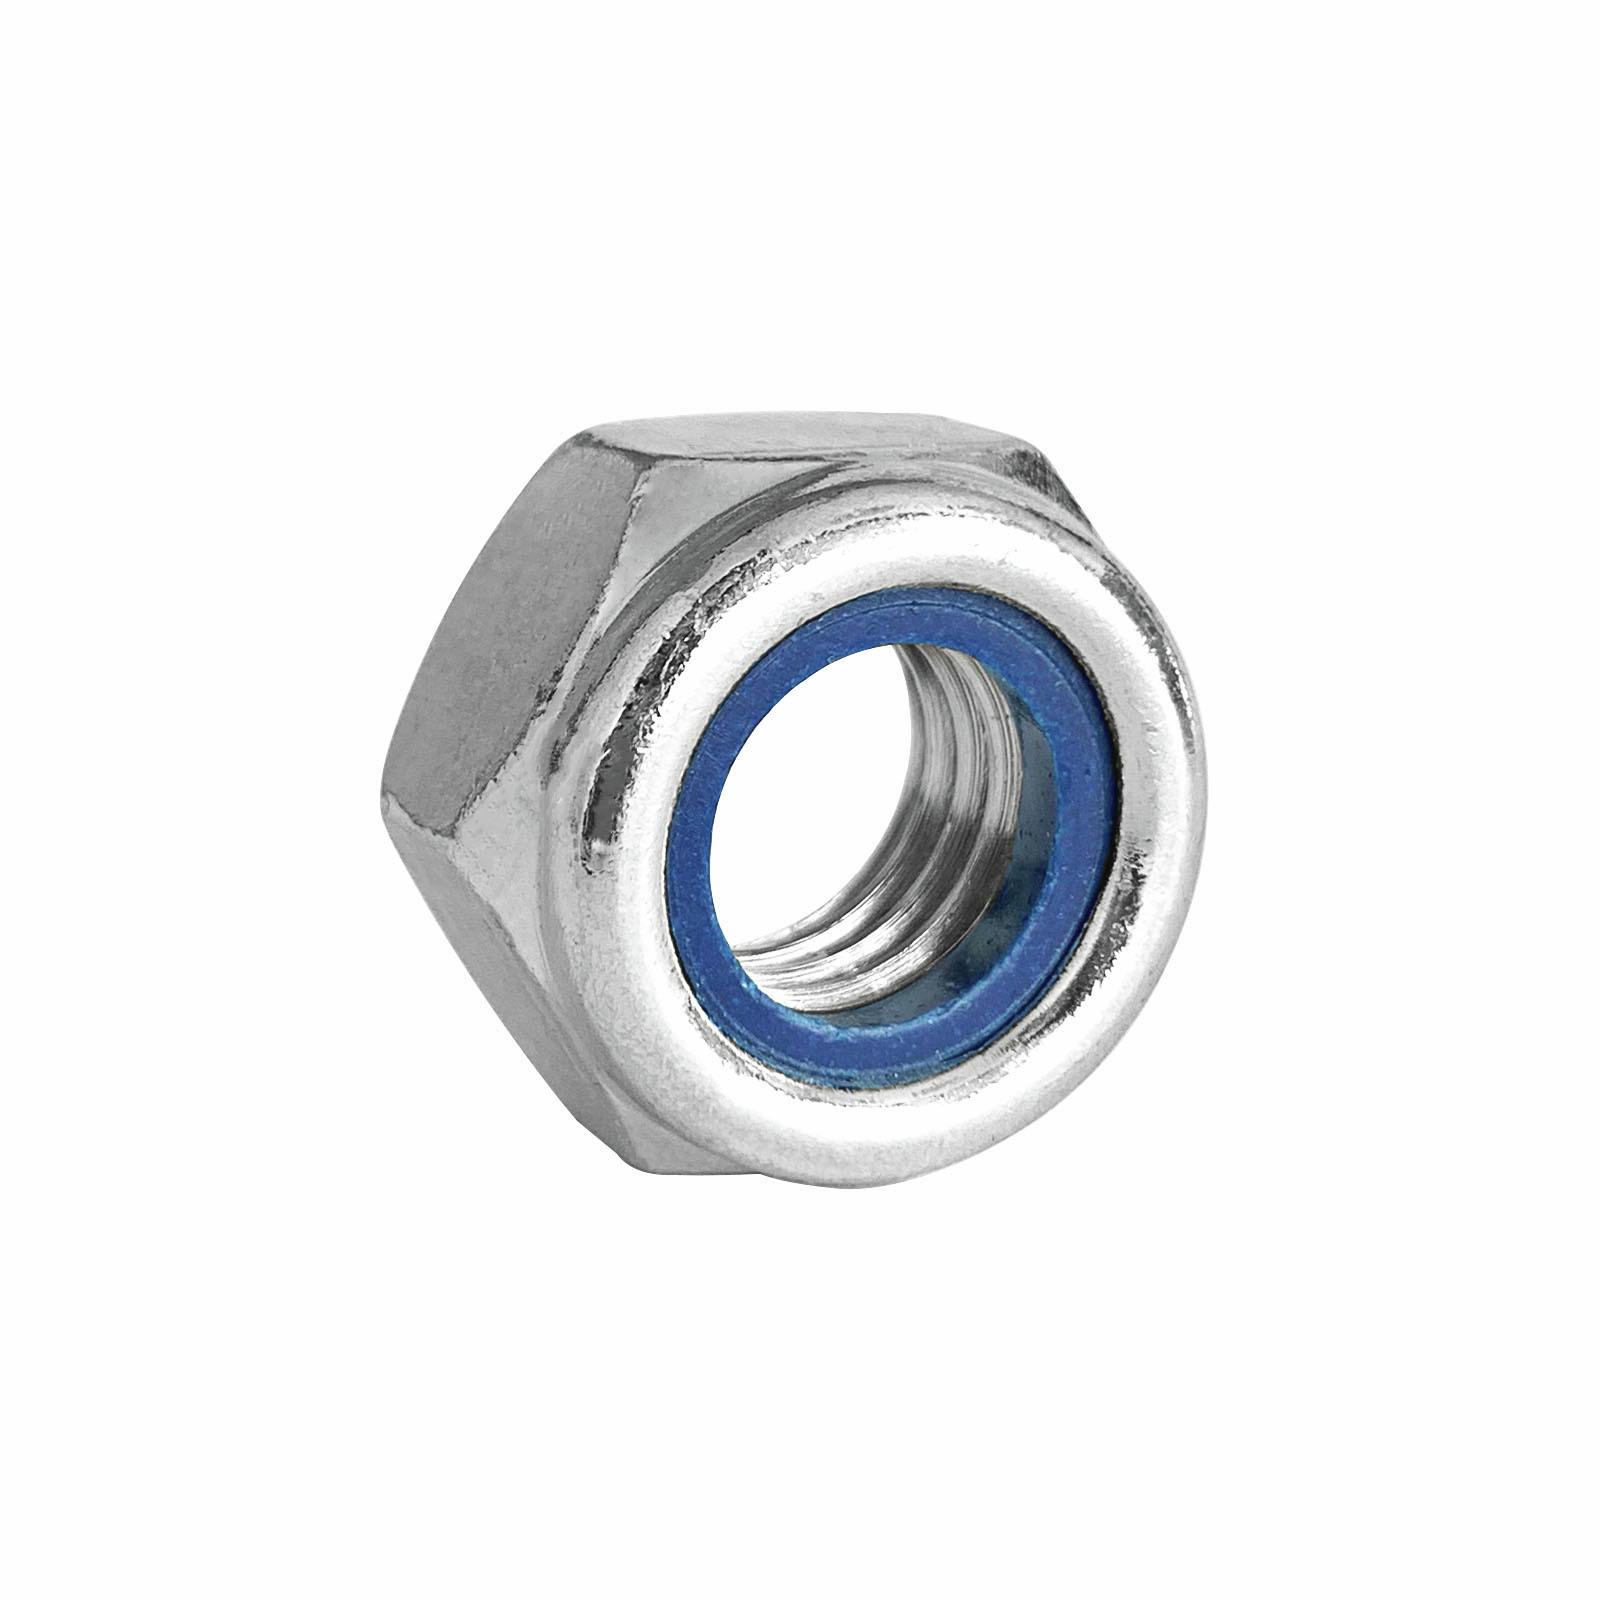 Pinnacle M5 Zinc Plated Nylon Lock Nut - 8 Pack